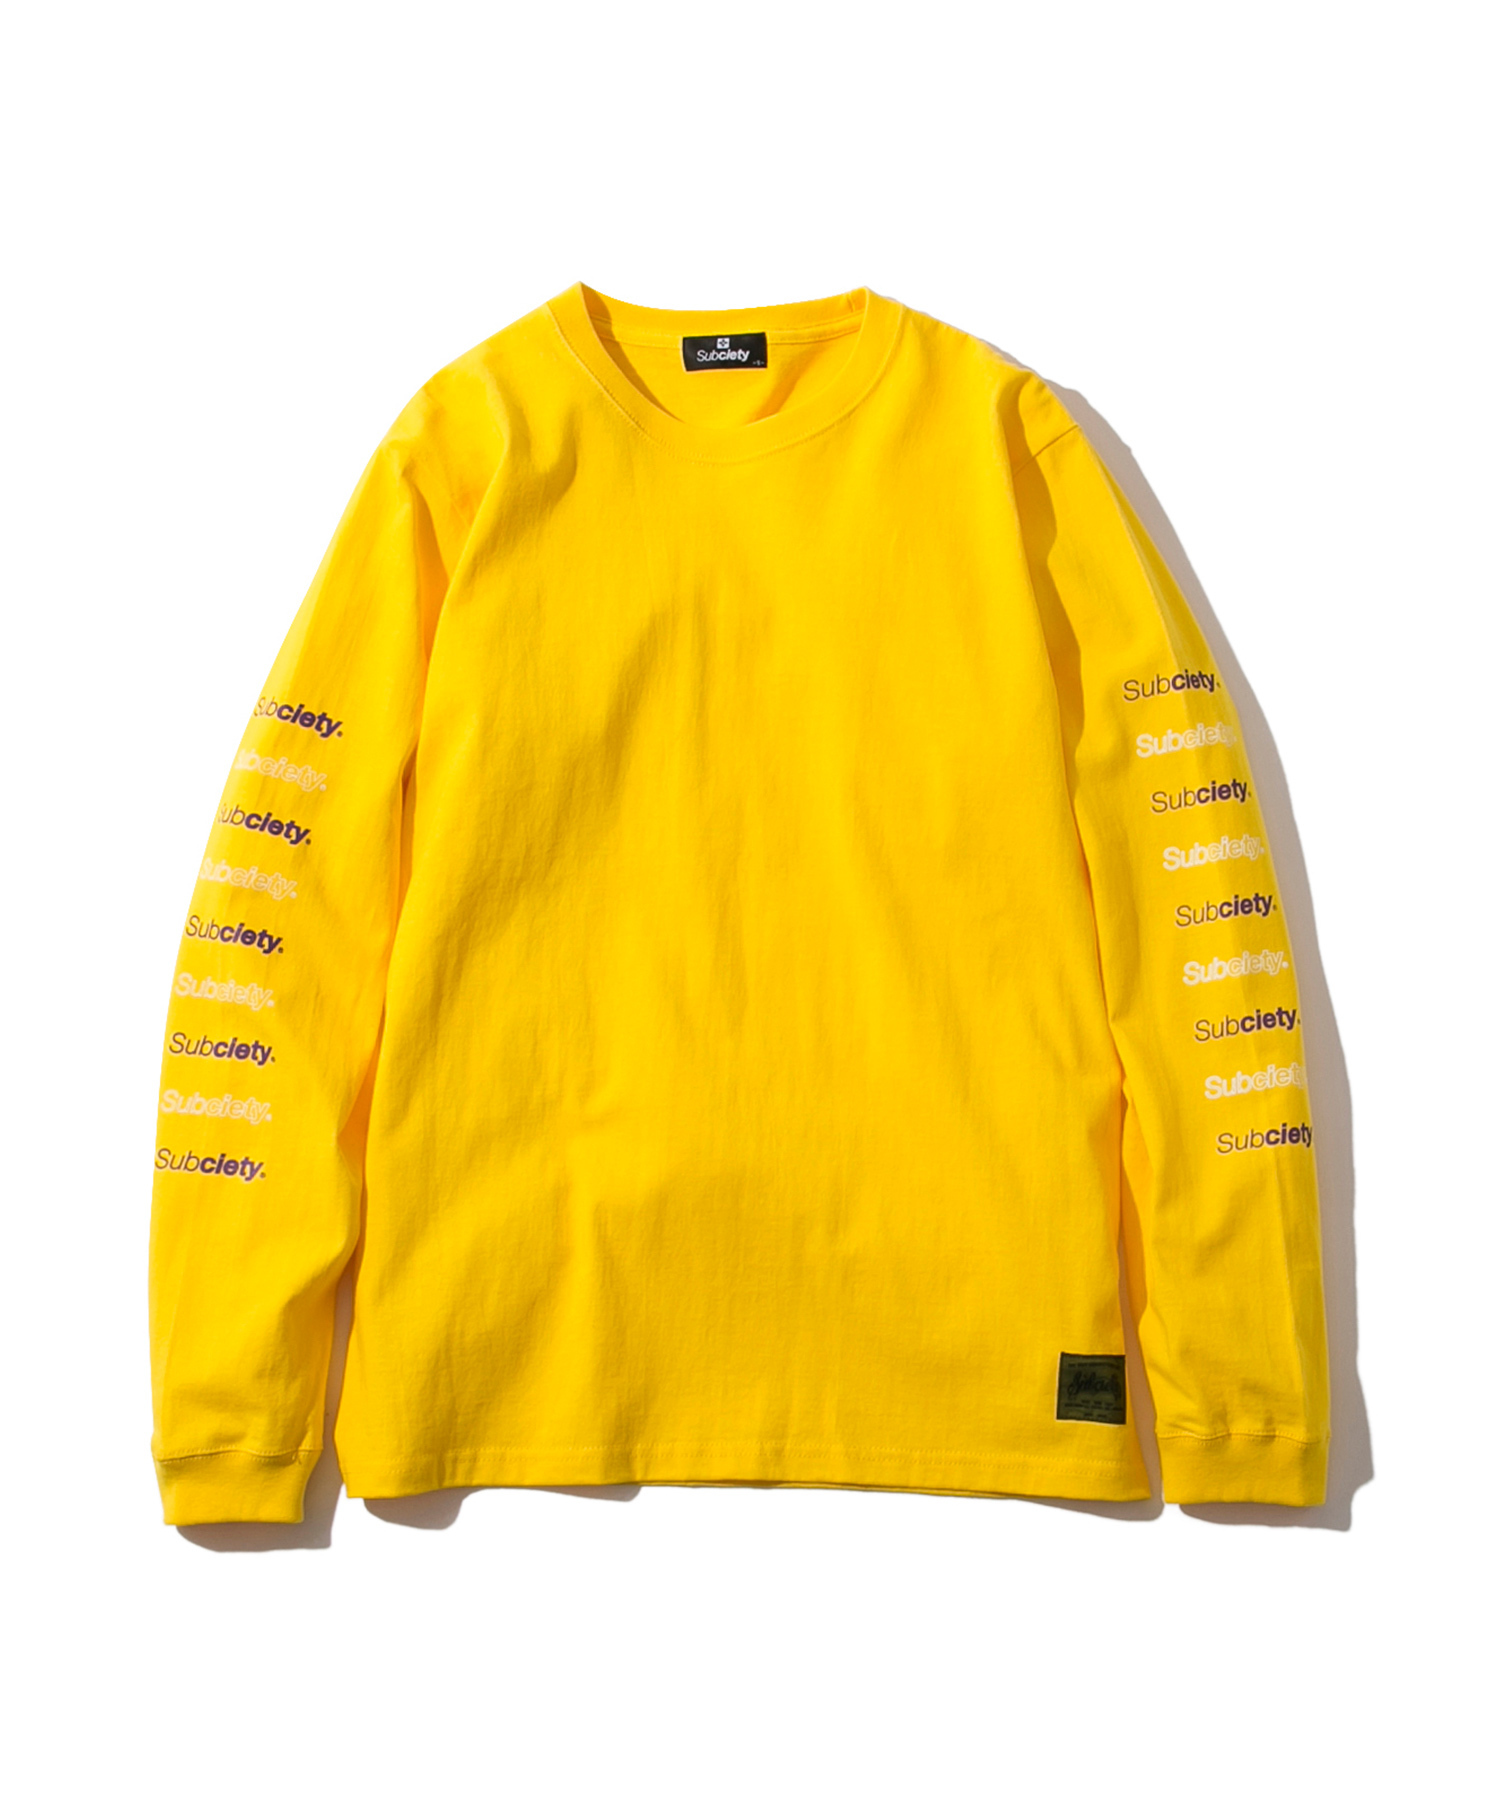 【Subciety | サブサエティ】RE:BASE L/S (Yellow)